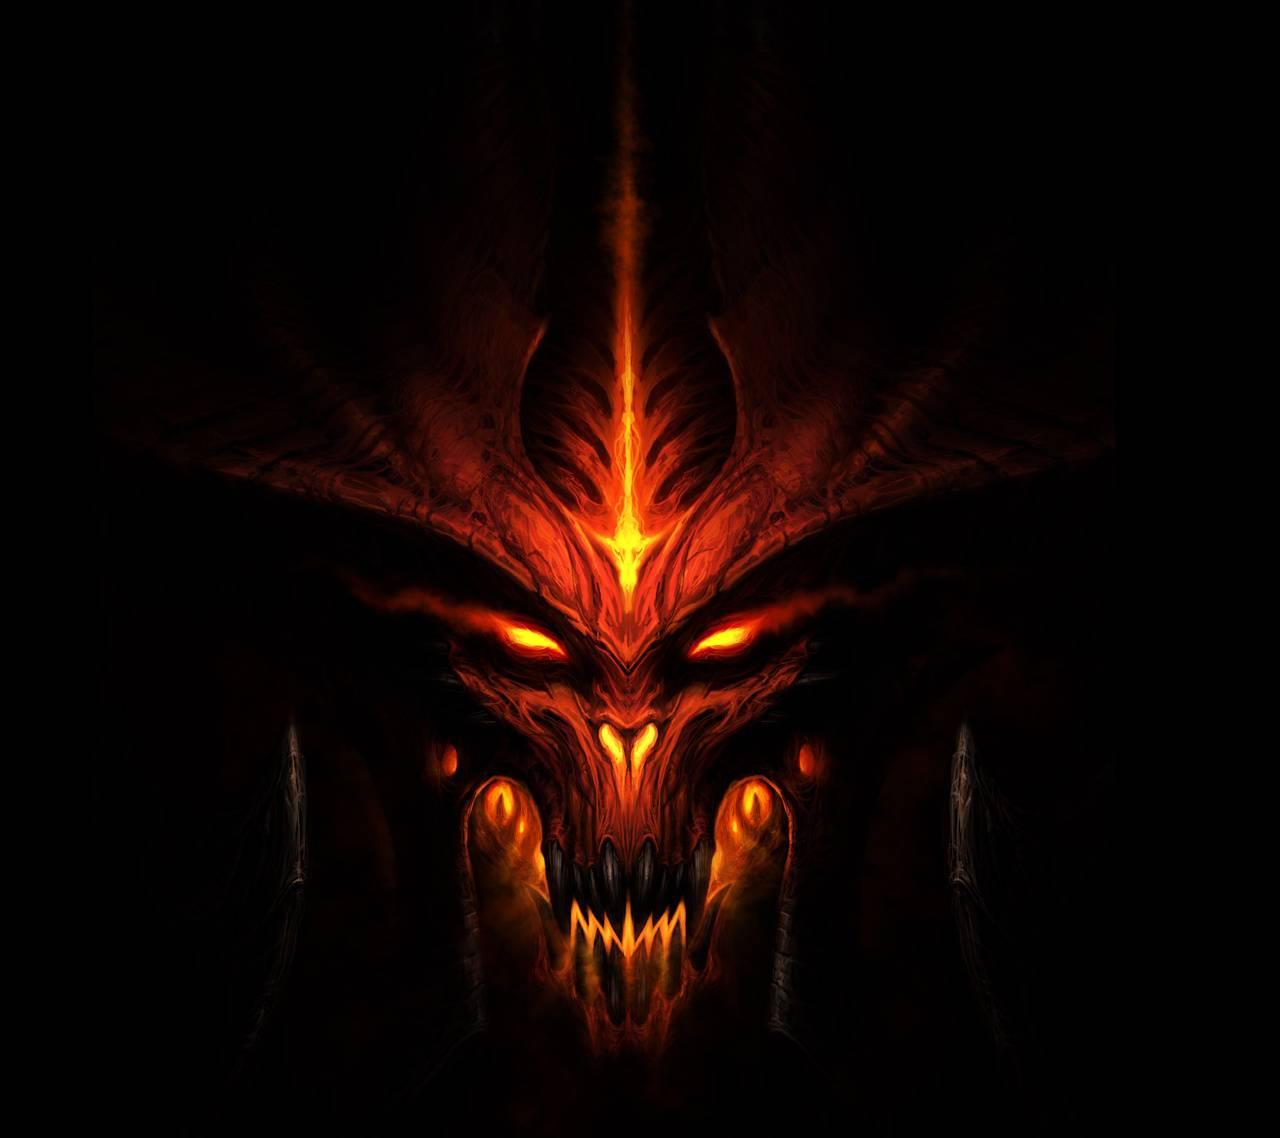 Diablo 3 Wallpaper By Vikina19 E1 Free On Zedge